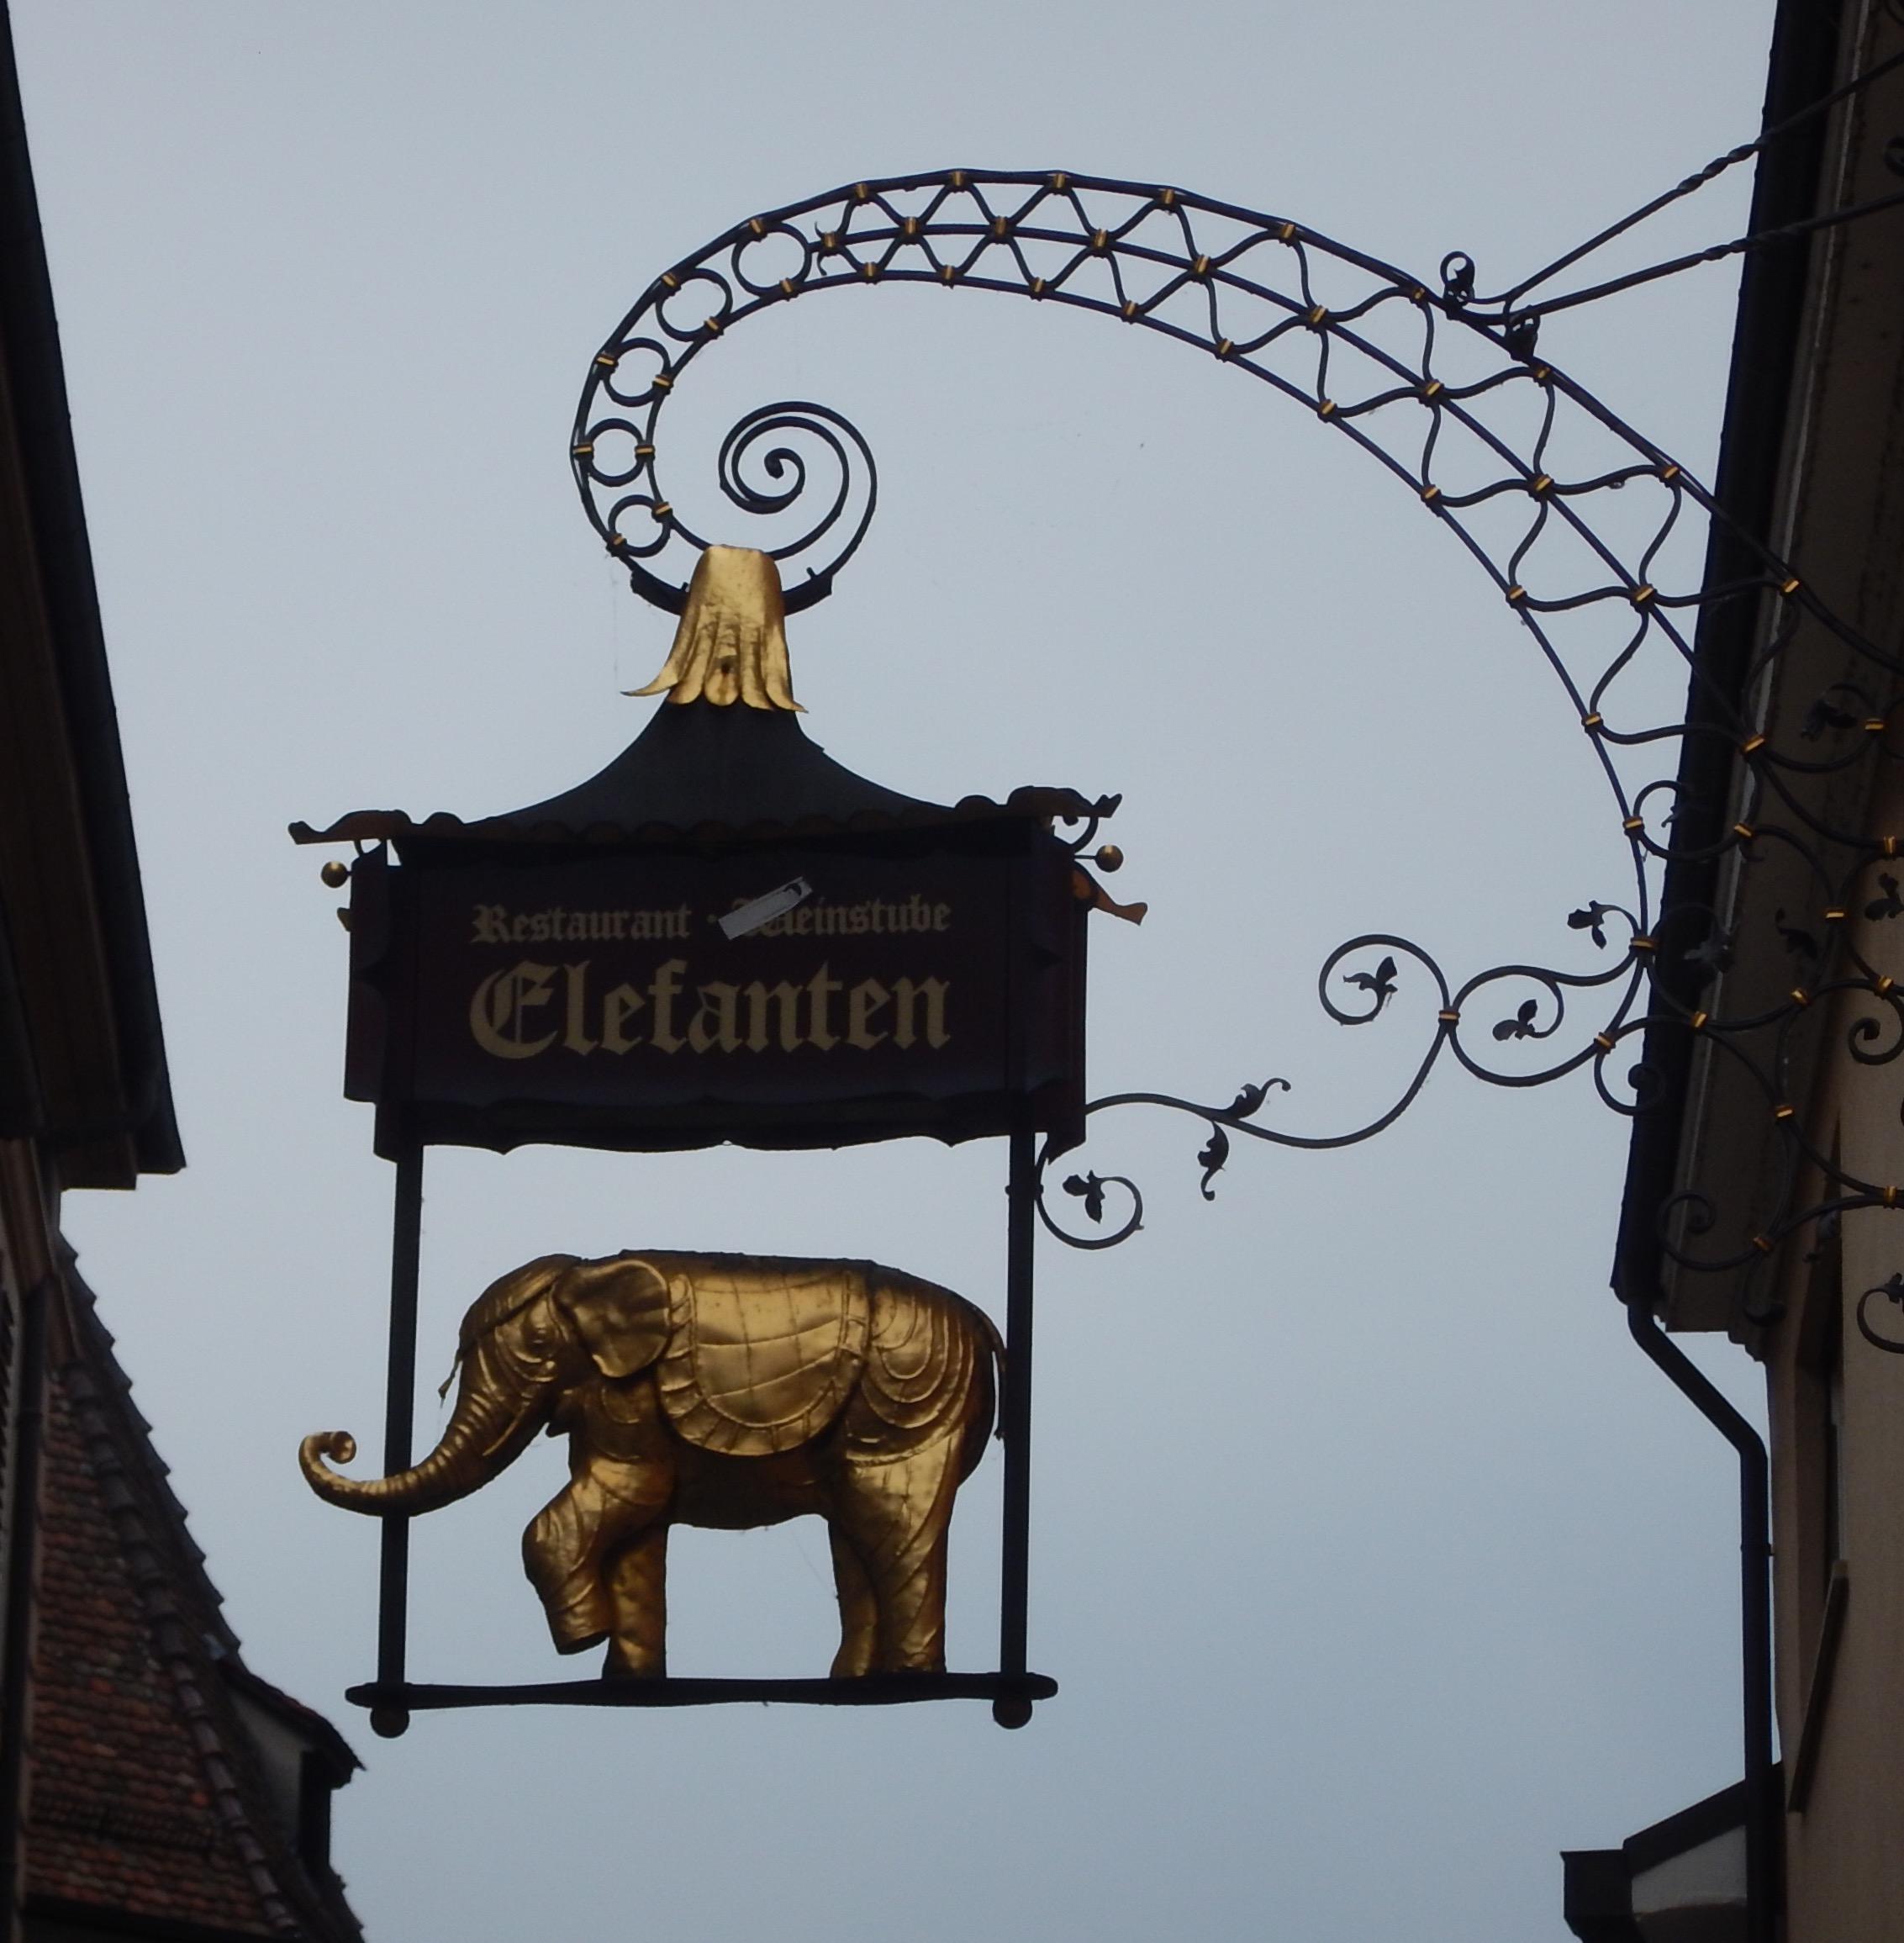 Elephanten Restaurant in Konstanz, Germany.